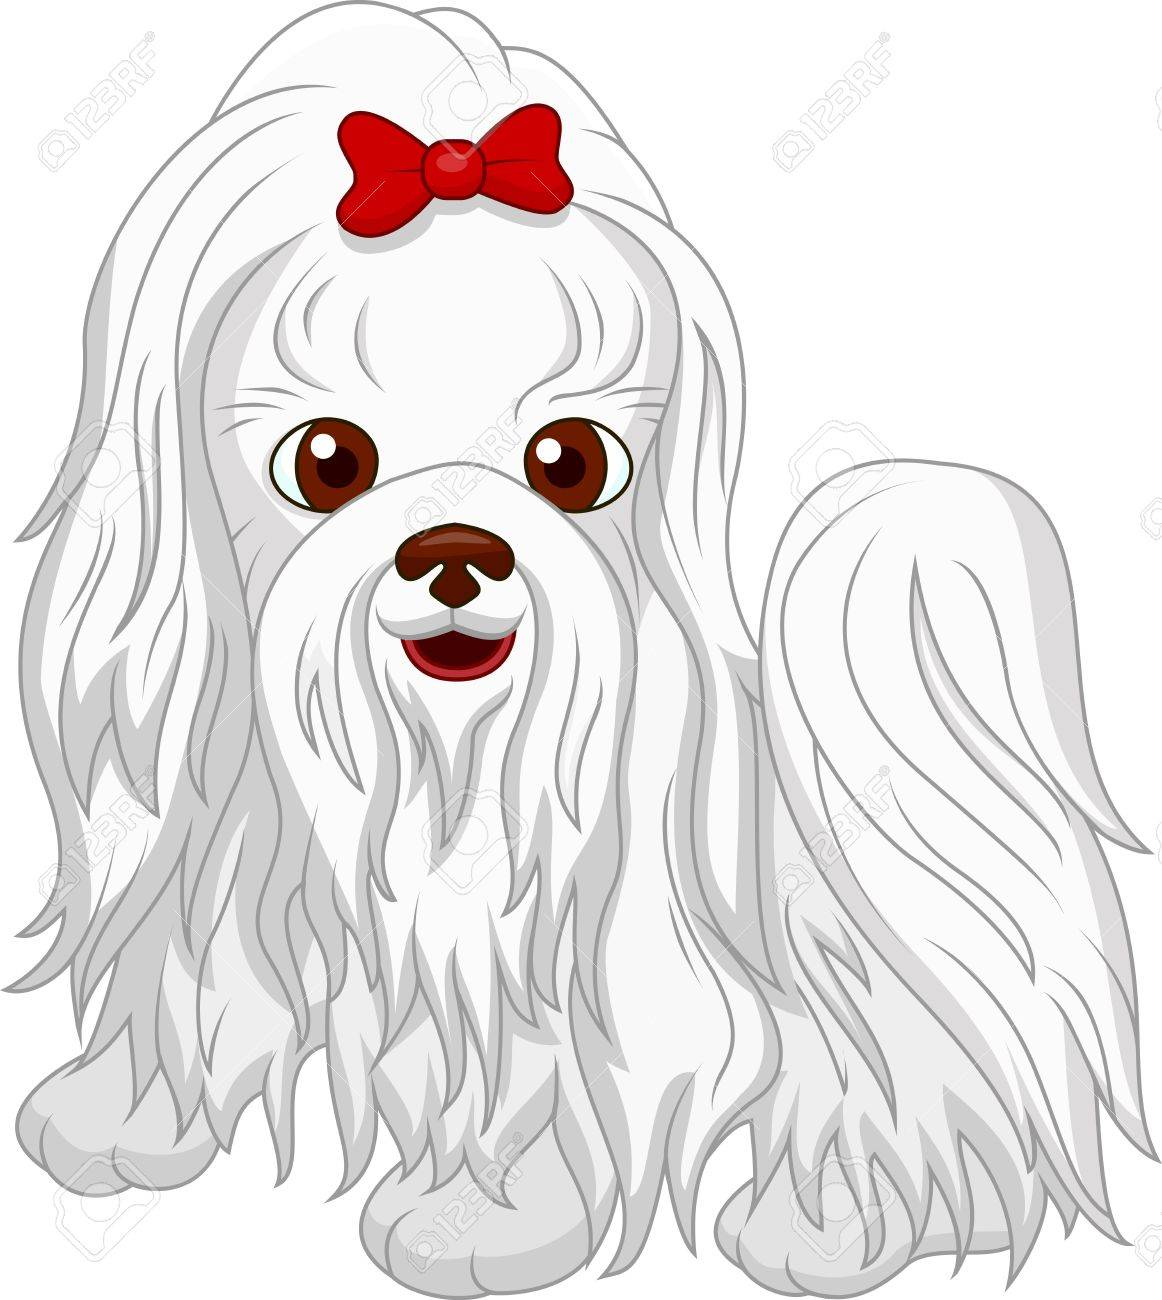 2 058 maltese dog stock illustrations cliparts and royalty free rh 123rf com clipart maltese cross fire maltese clipart